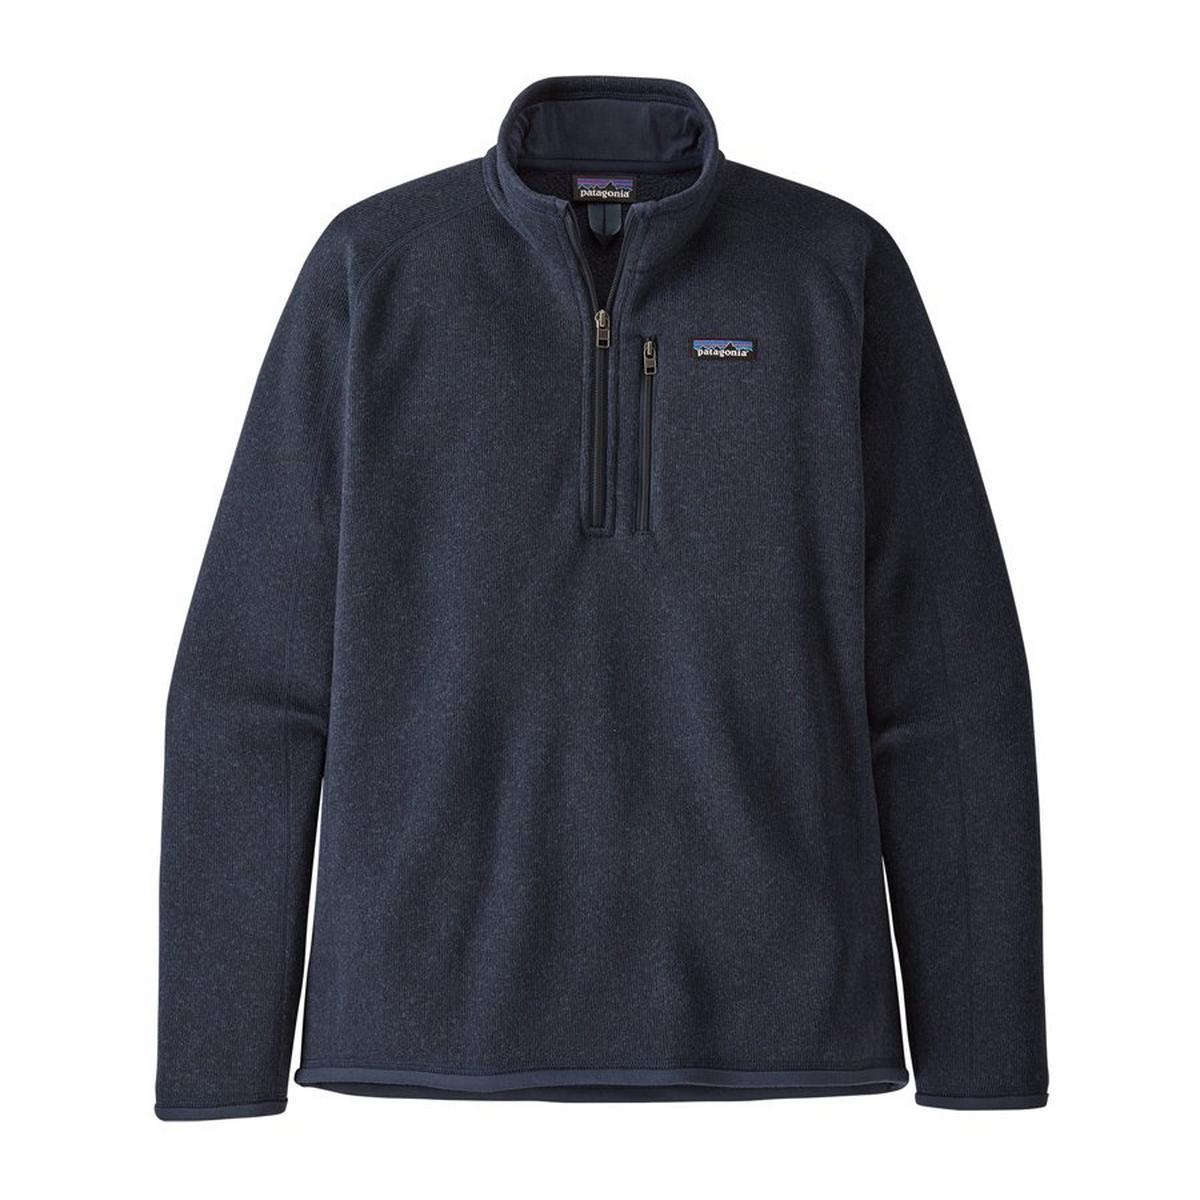 Patagonia Men's Patagonia Better Sweater Quarter Zip Fleece - Navy